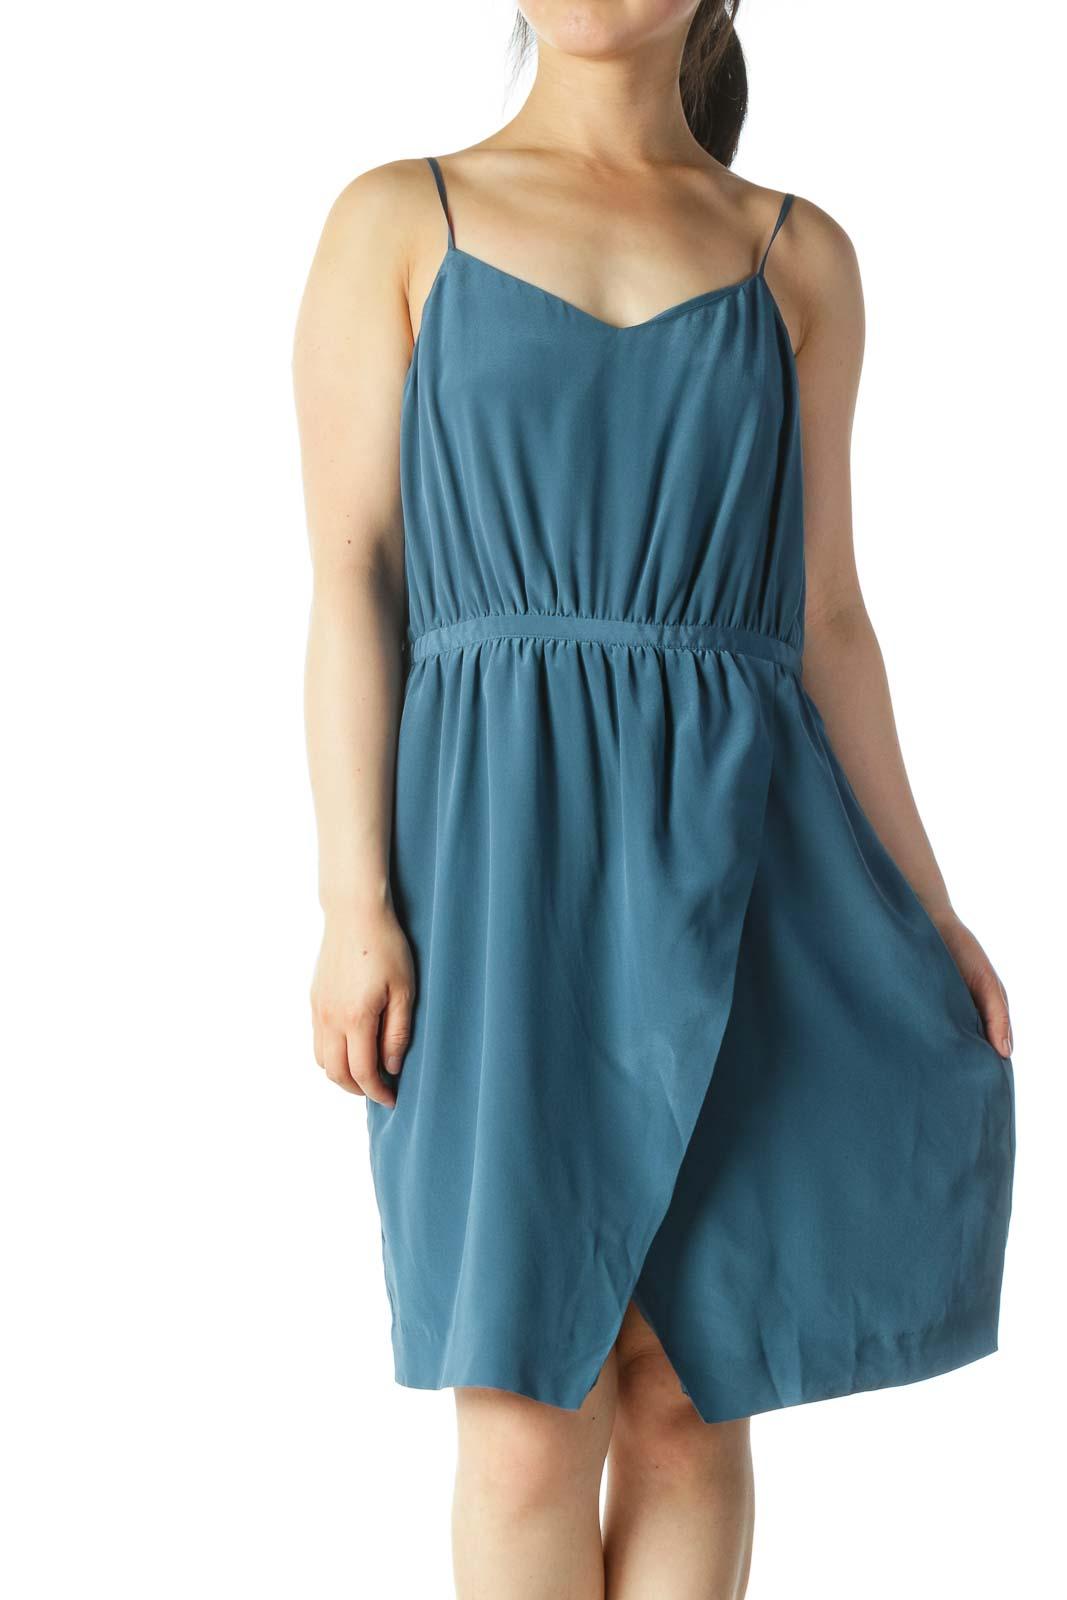 Blue Slitted Cocktail Dress